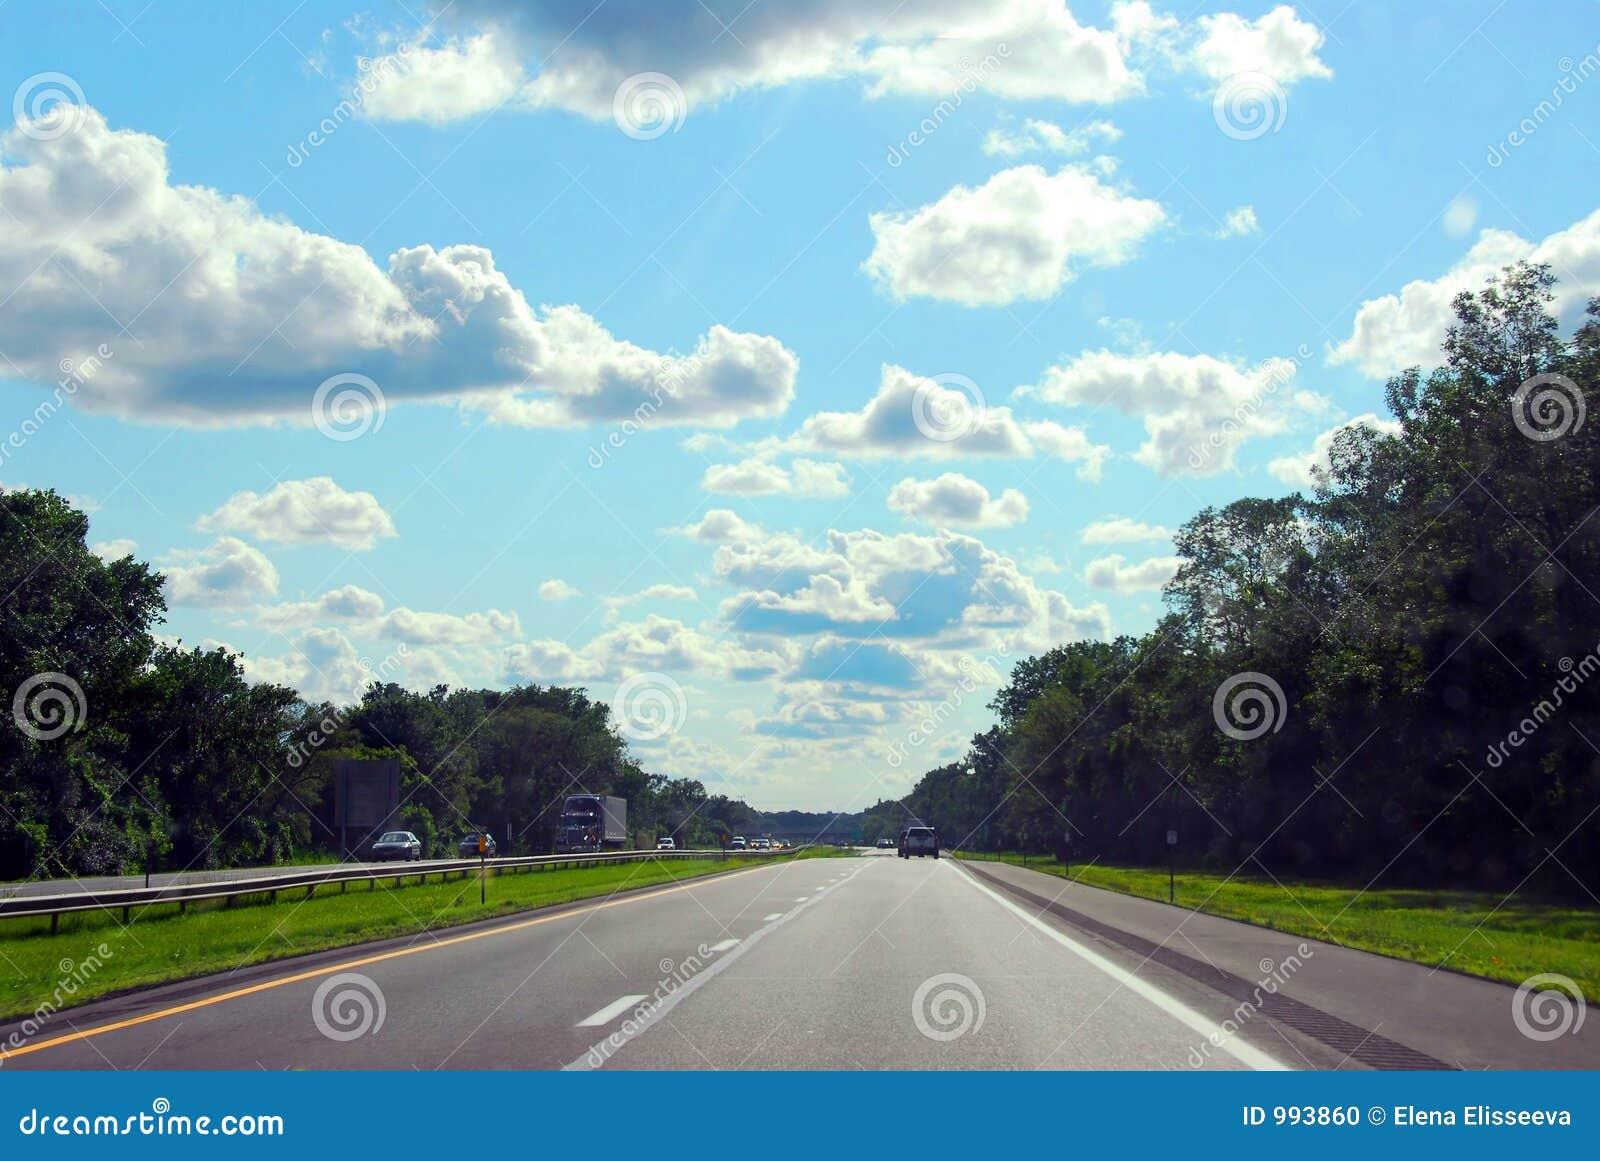 Huvudväg